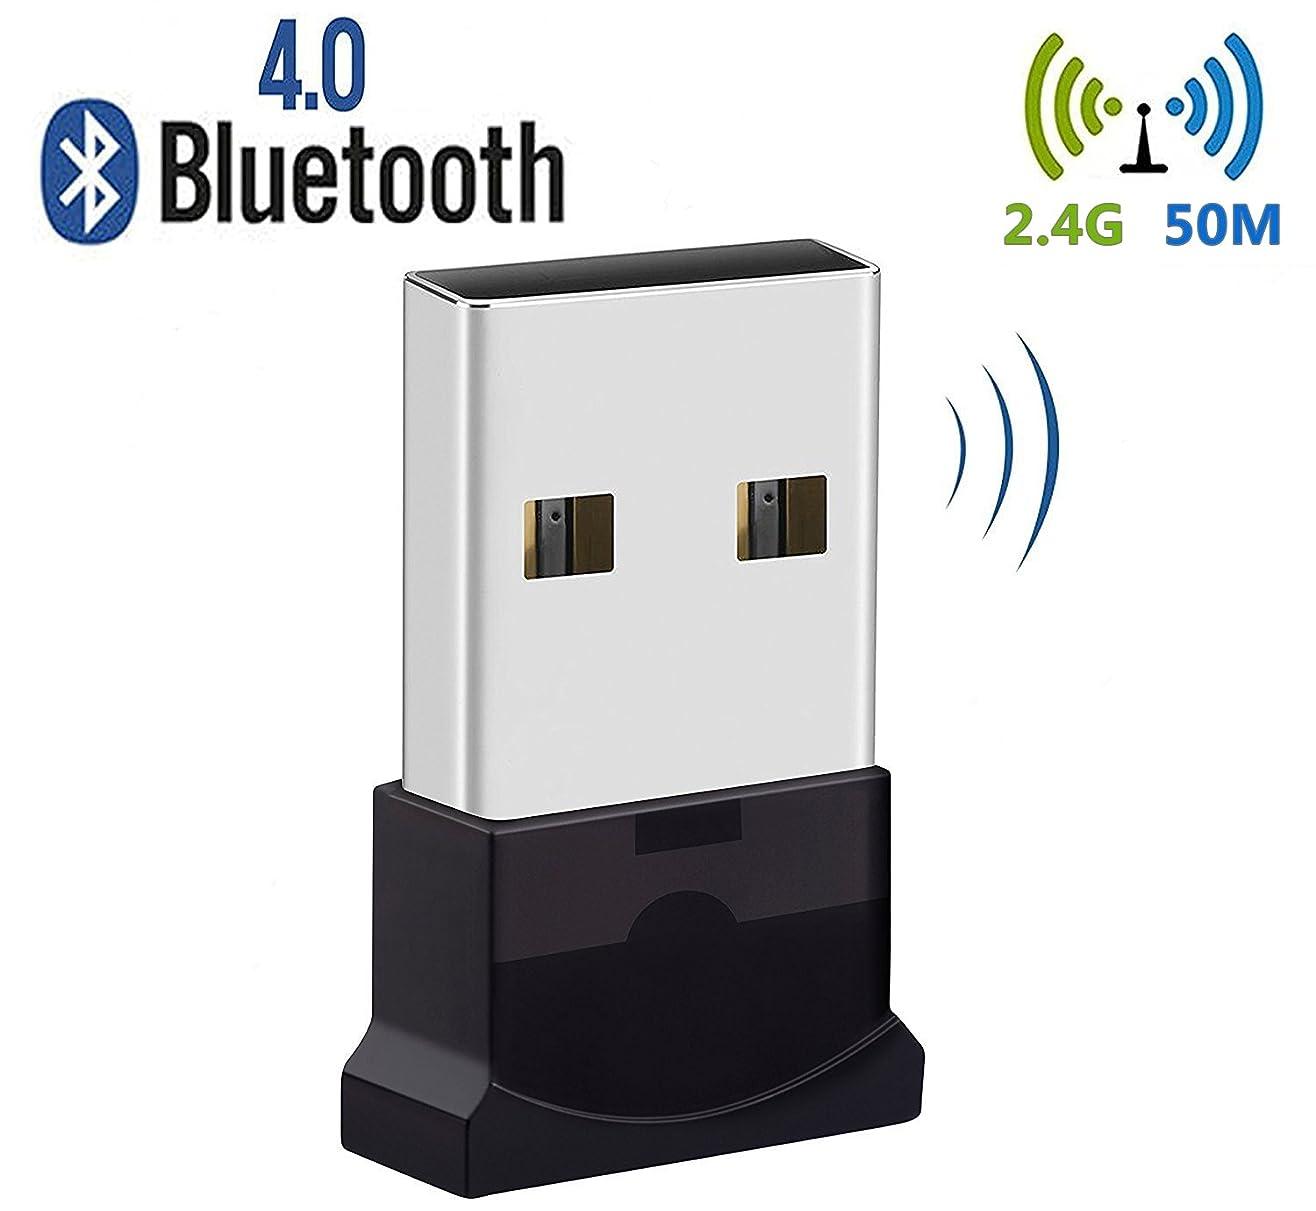 Bluetooth USB アダプタ ブルートゥース ドングル Ver4.0 EDR/LE対応 Class2 Windows対応 Dongle CSRスタック付属 ワイヤレス 無線 省電力 超小型